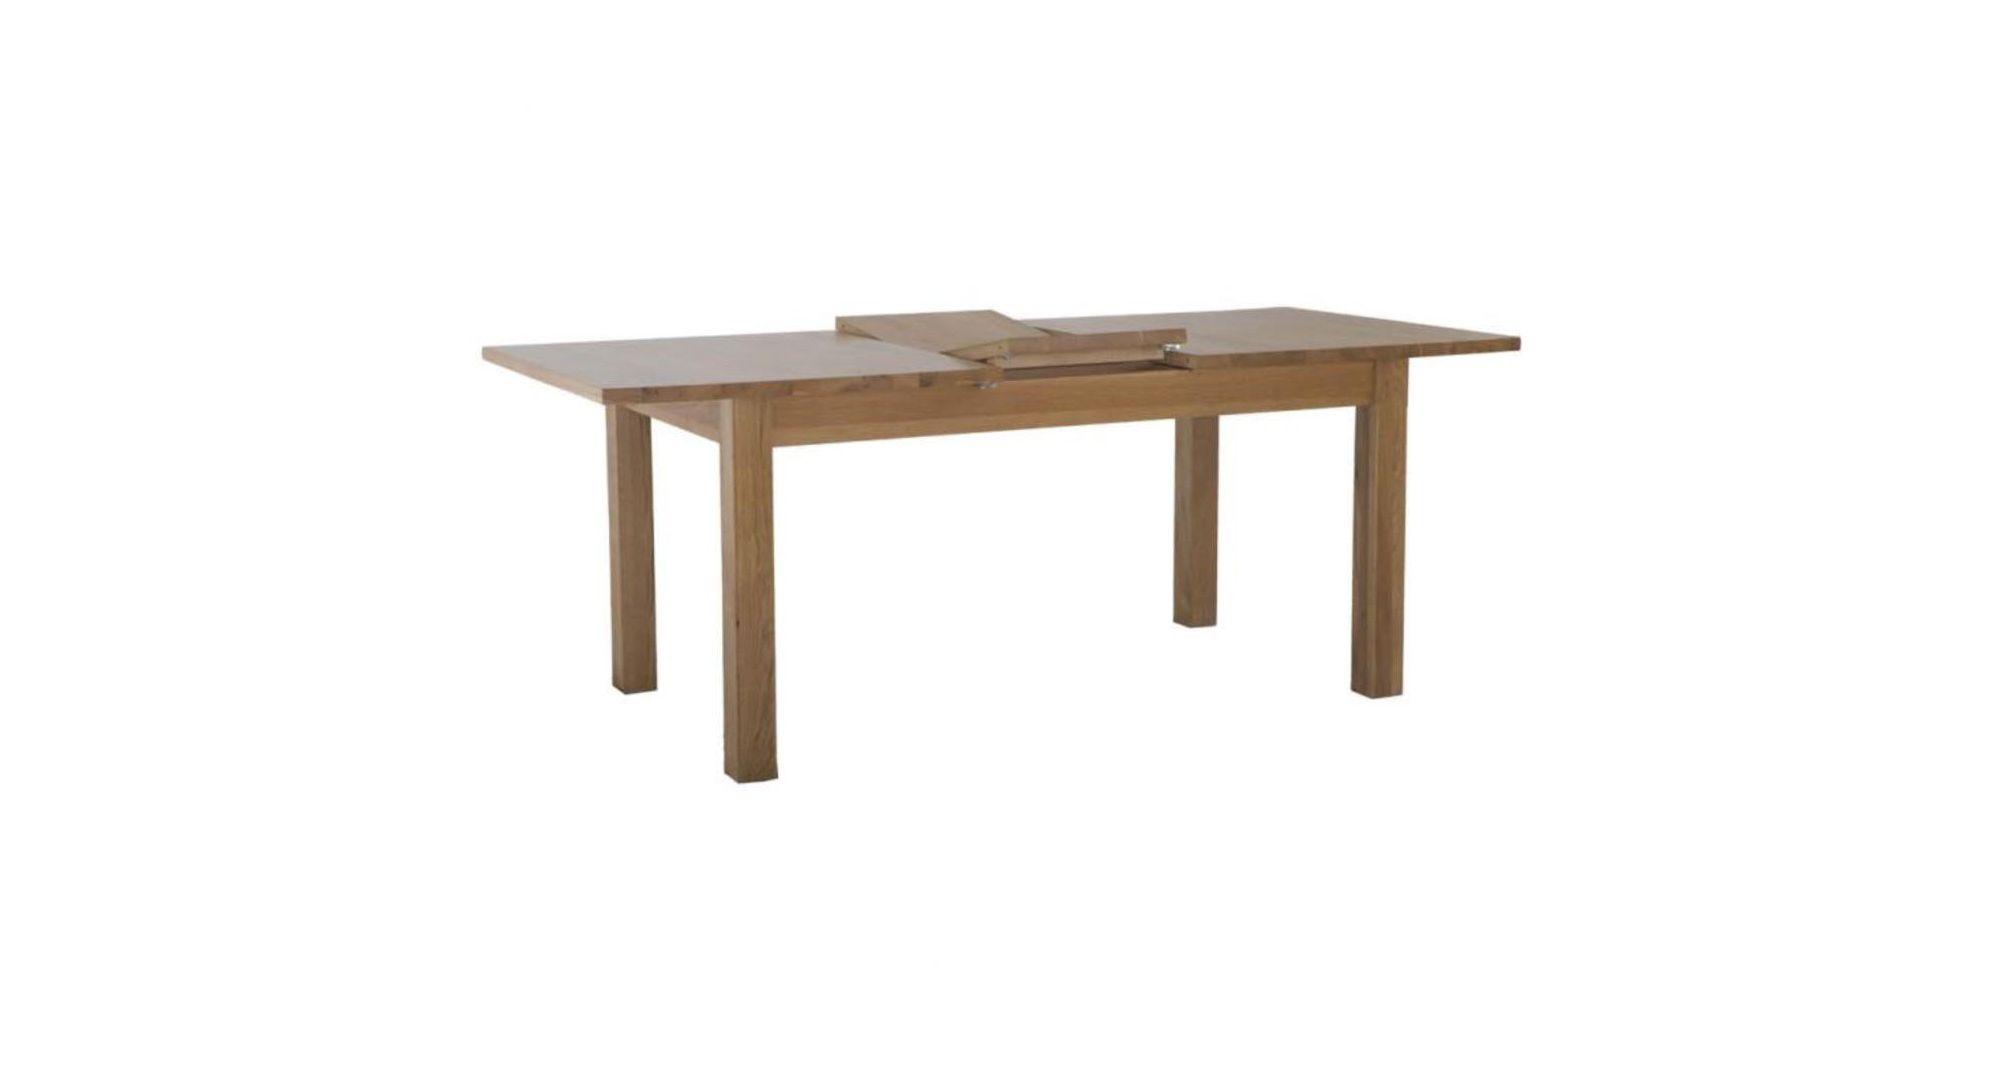 Extending Table 187 Tesco Extending Tables : 378 4576PI1000015MNwid2000amphei2000 from extendingtable.co.uk size 2000 x 2000 jpeg 42kB